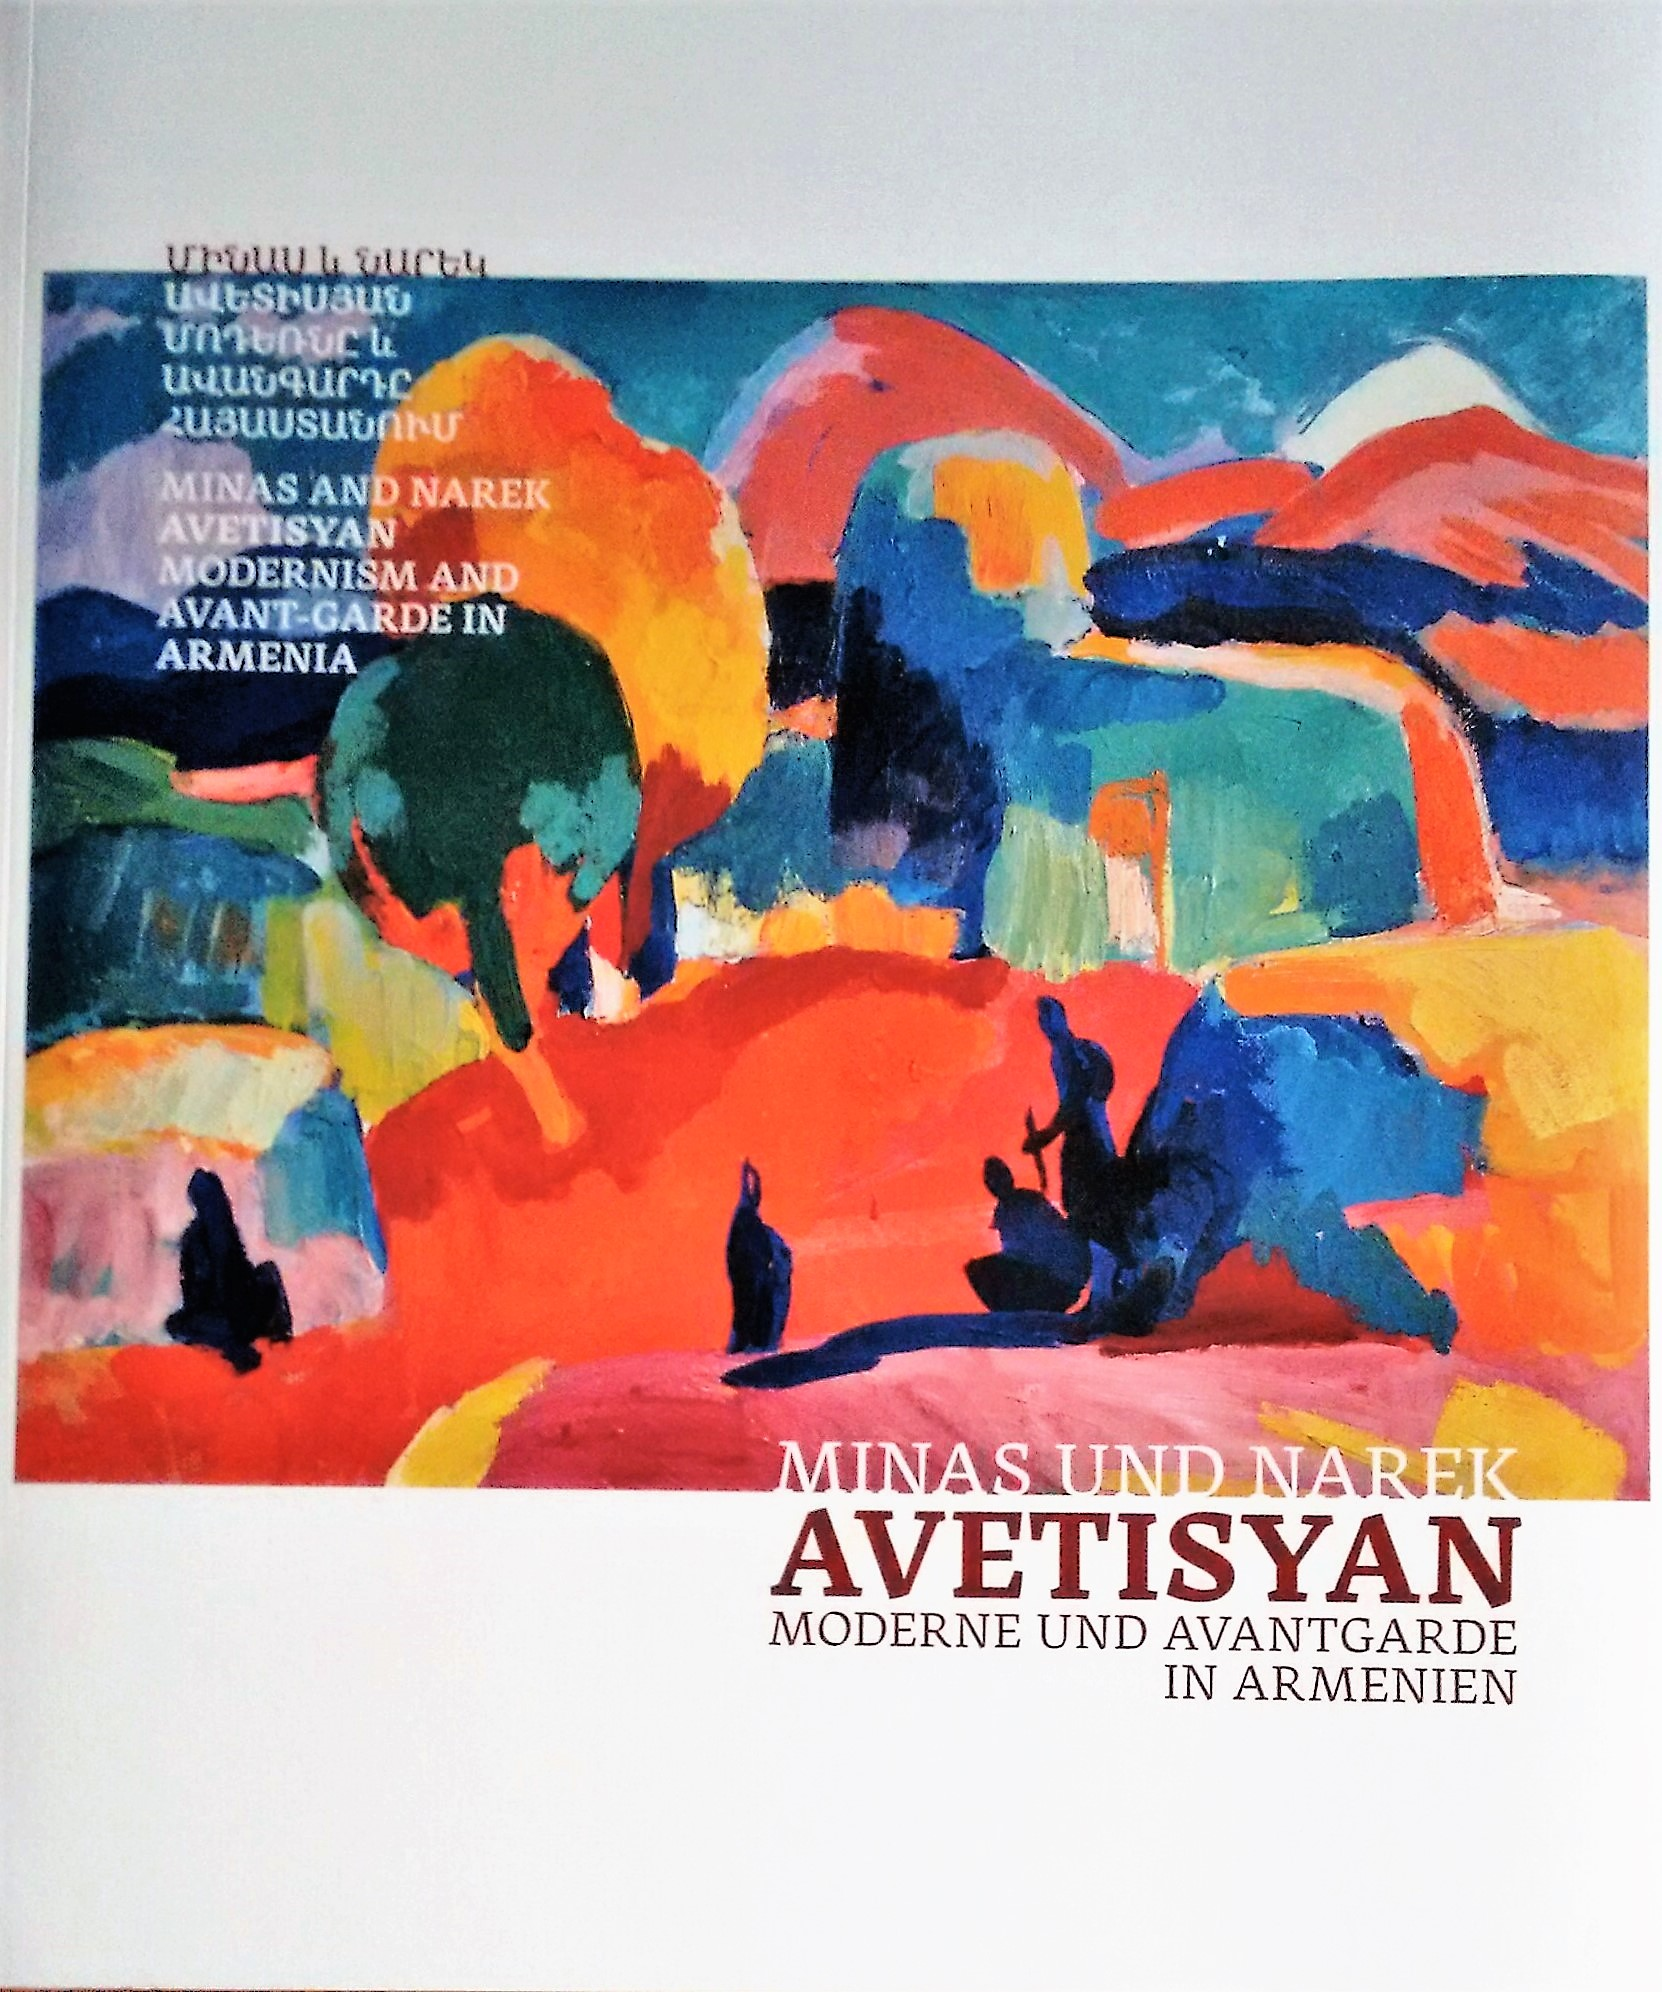 Exhibition Catalogue Minas And Narek Avetisyan: Modernism And Avant-Garde In Armenia (Stiftung Moritzburg Halle, 2014).